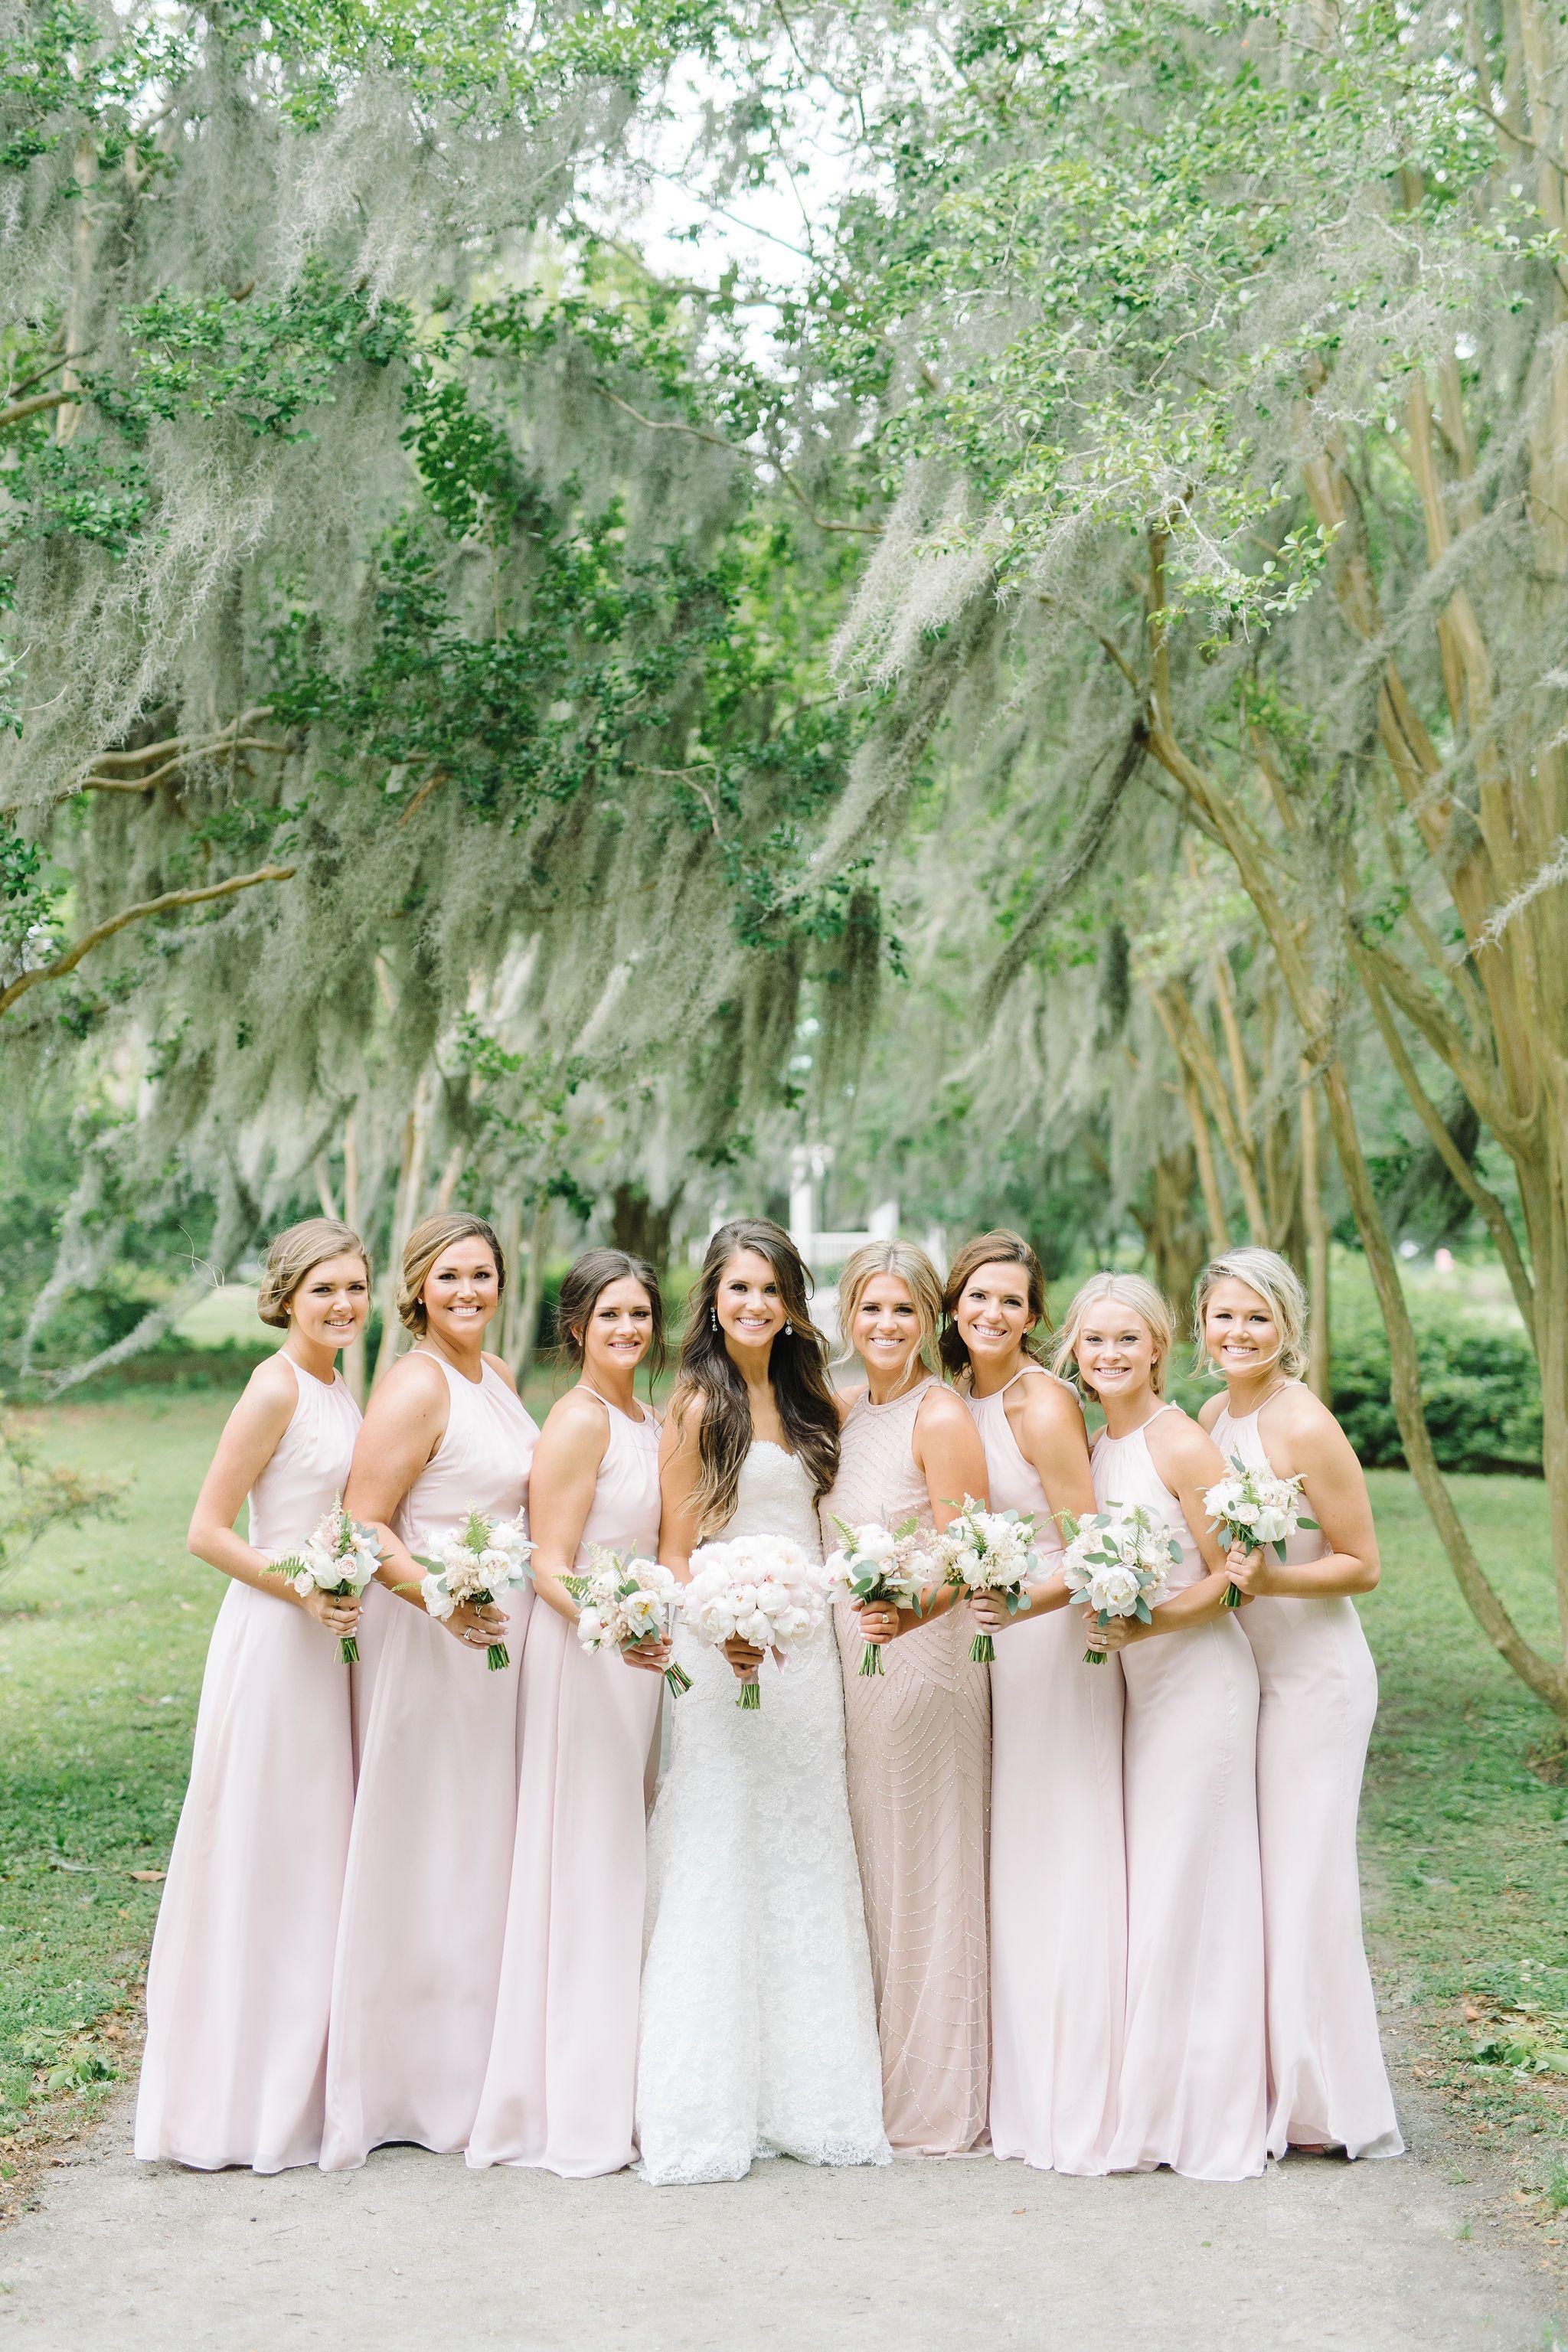 Beautiful Light Pink Bridesmaids Dresses For A Spring Wedding Light Pink Bridesmaid Dresses Light Pink Bridesmaids Matching Bridesmaids Dresses [ 3072 x 2048 Pixel ]